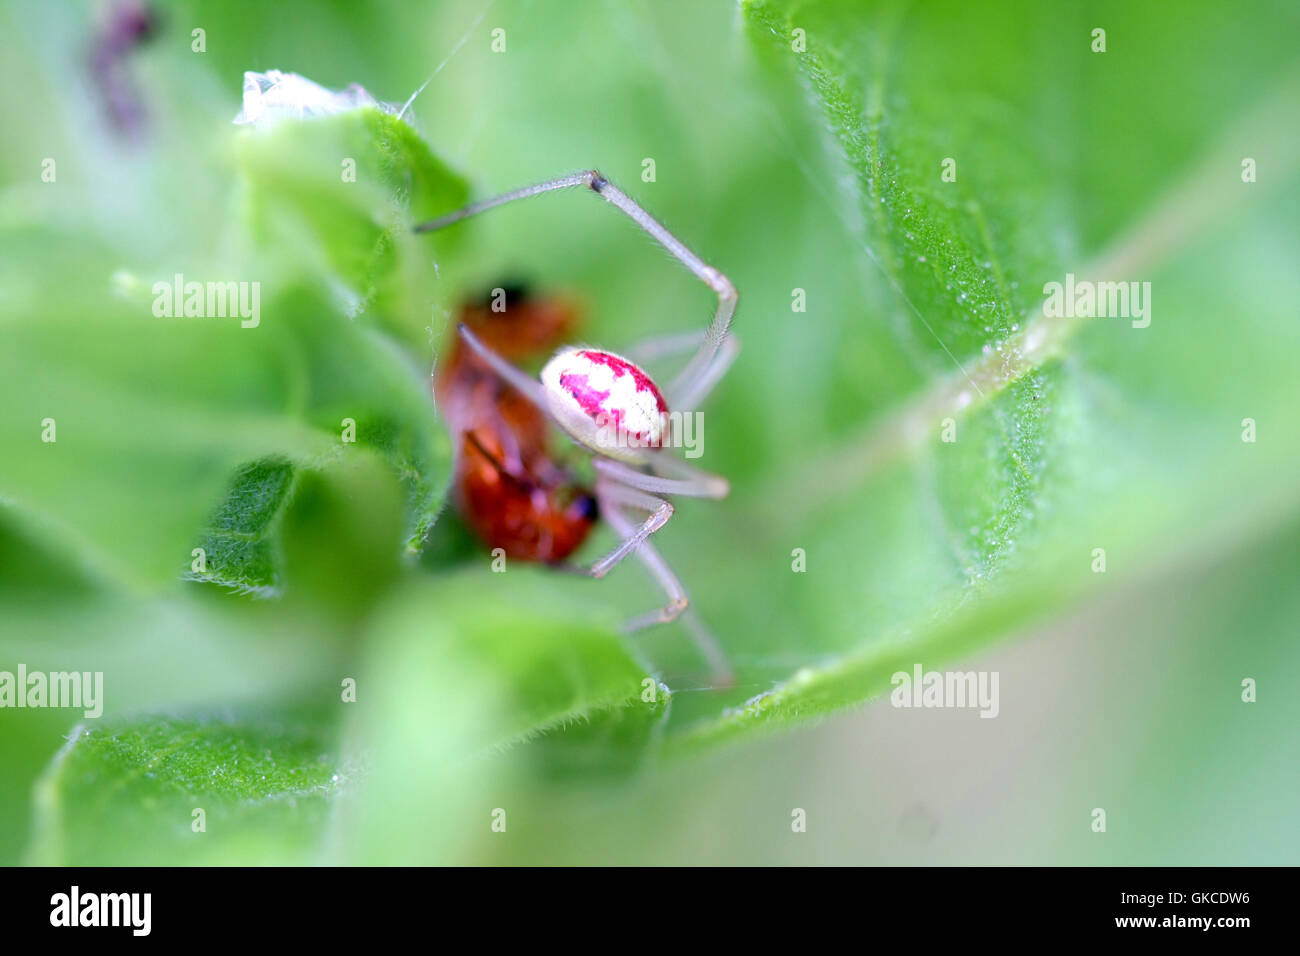 Candy-stripe Spider Enoplognatha ovata - Stock Image